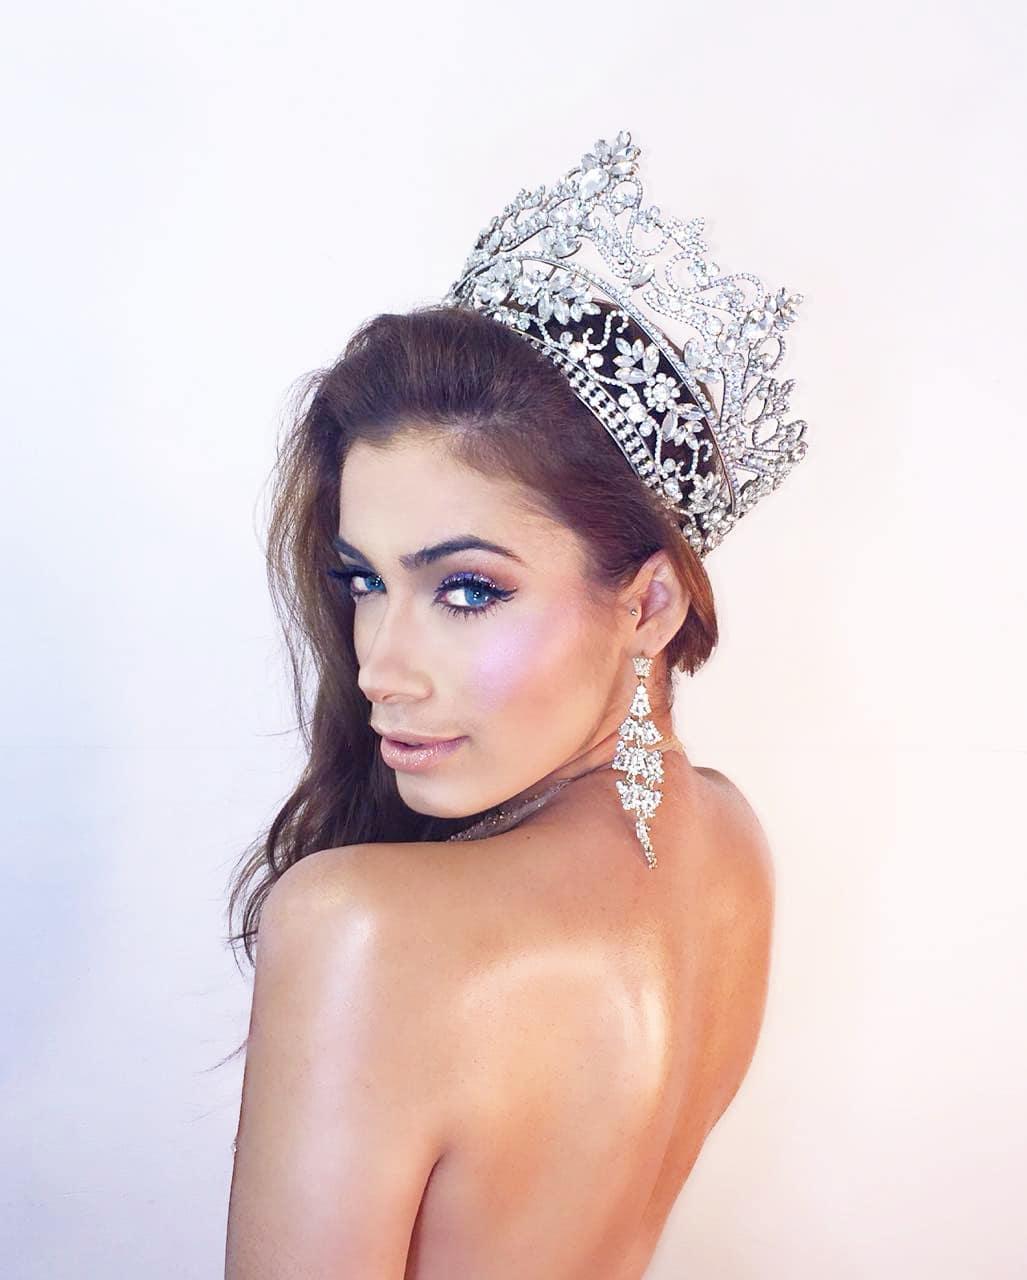 natalia gurgel, top model brasil 2021/miss morada nova 2019/miss sertao central empresarial 2018/top 20 de miss asia pacific international 2018, representando o uruguai. 37280810